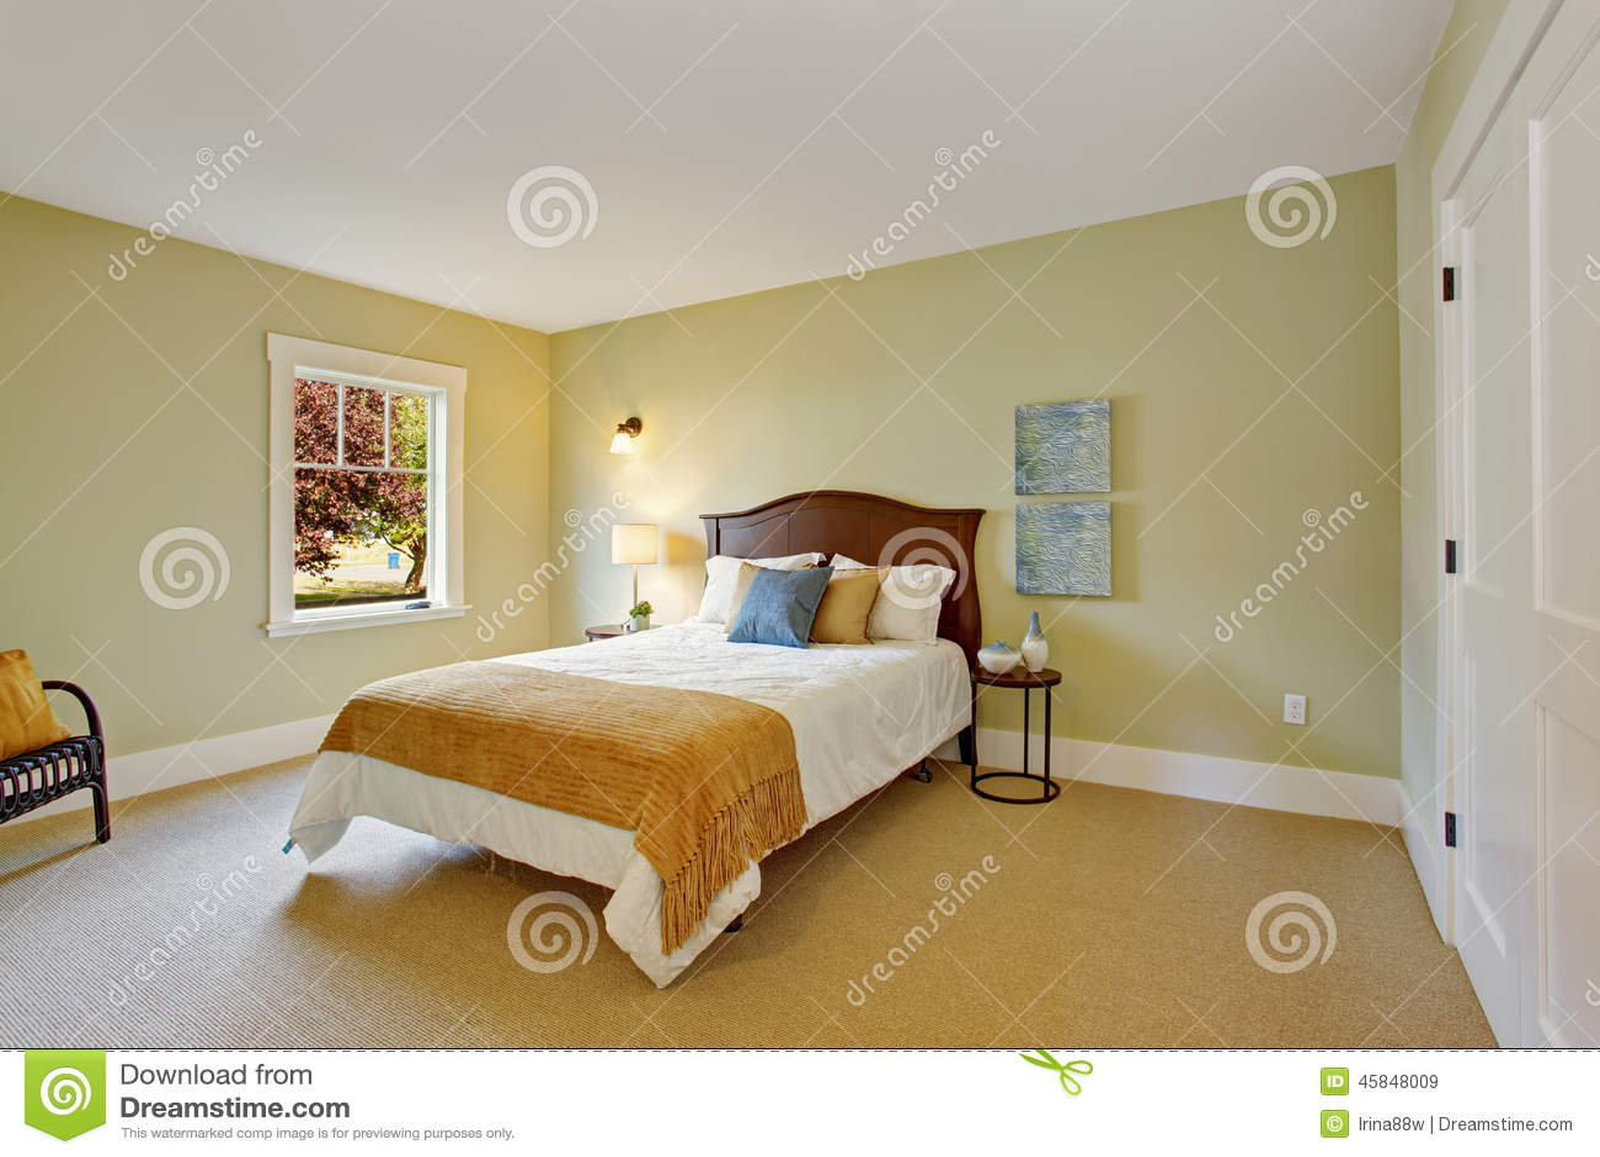 Wohnzimmer Farbe Apricot Feng Shui Farben Farbgestaltung Im Feng Shui